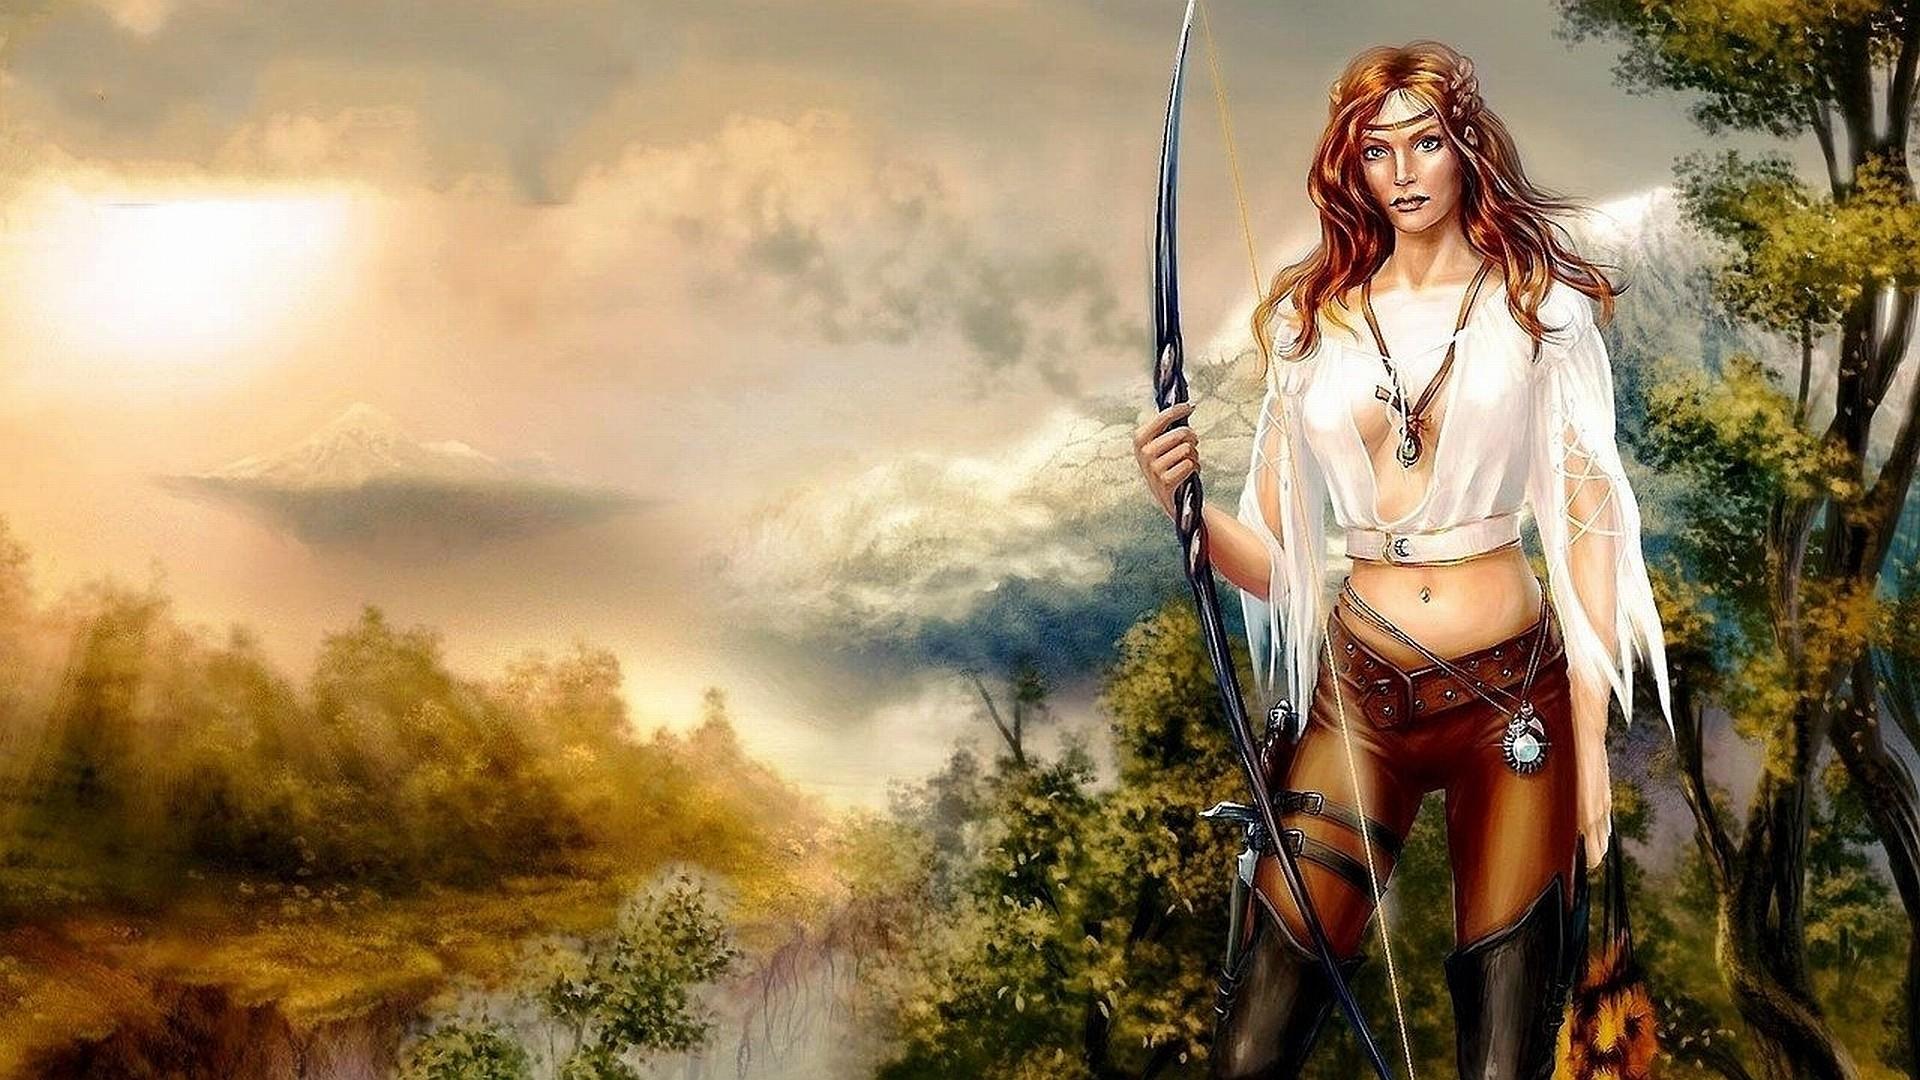 1113 Women Warrior HD Wallpapers | Backgrounds – Wallpaper Abyss